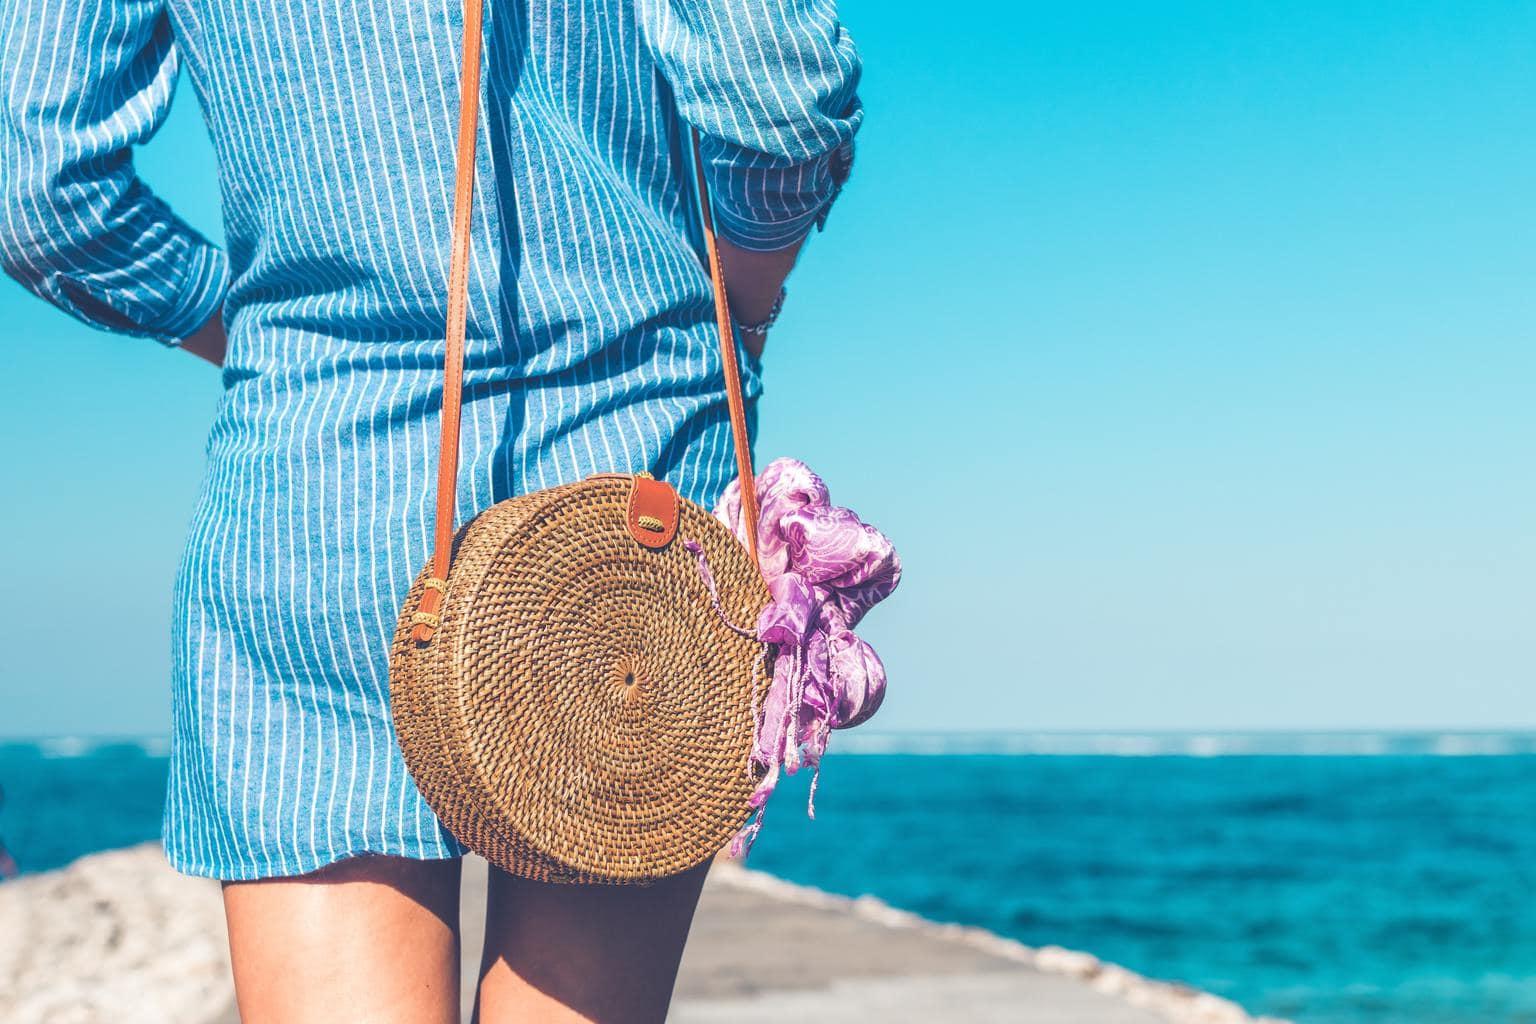 Summer girl at the beach